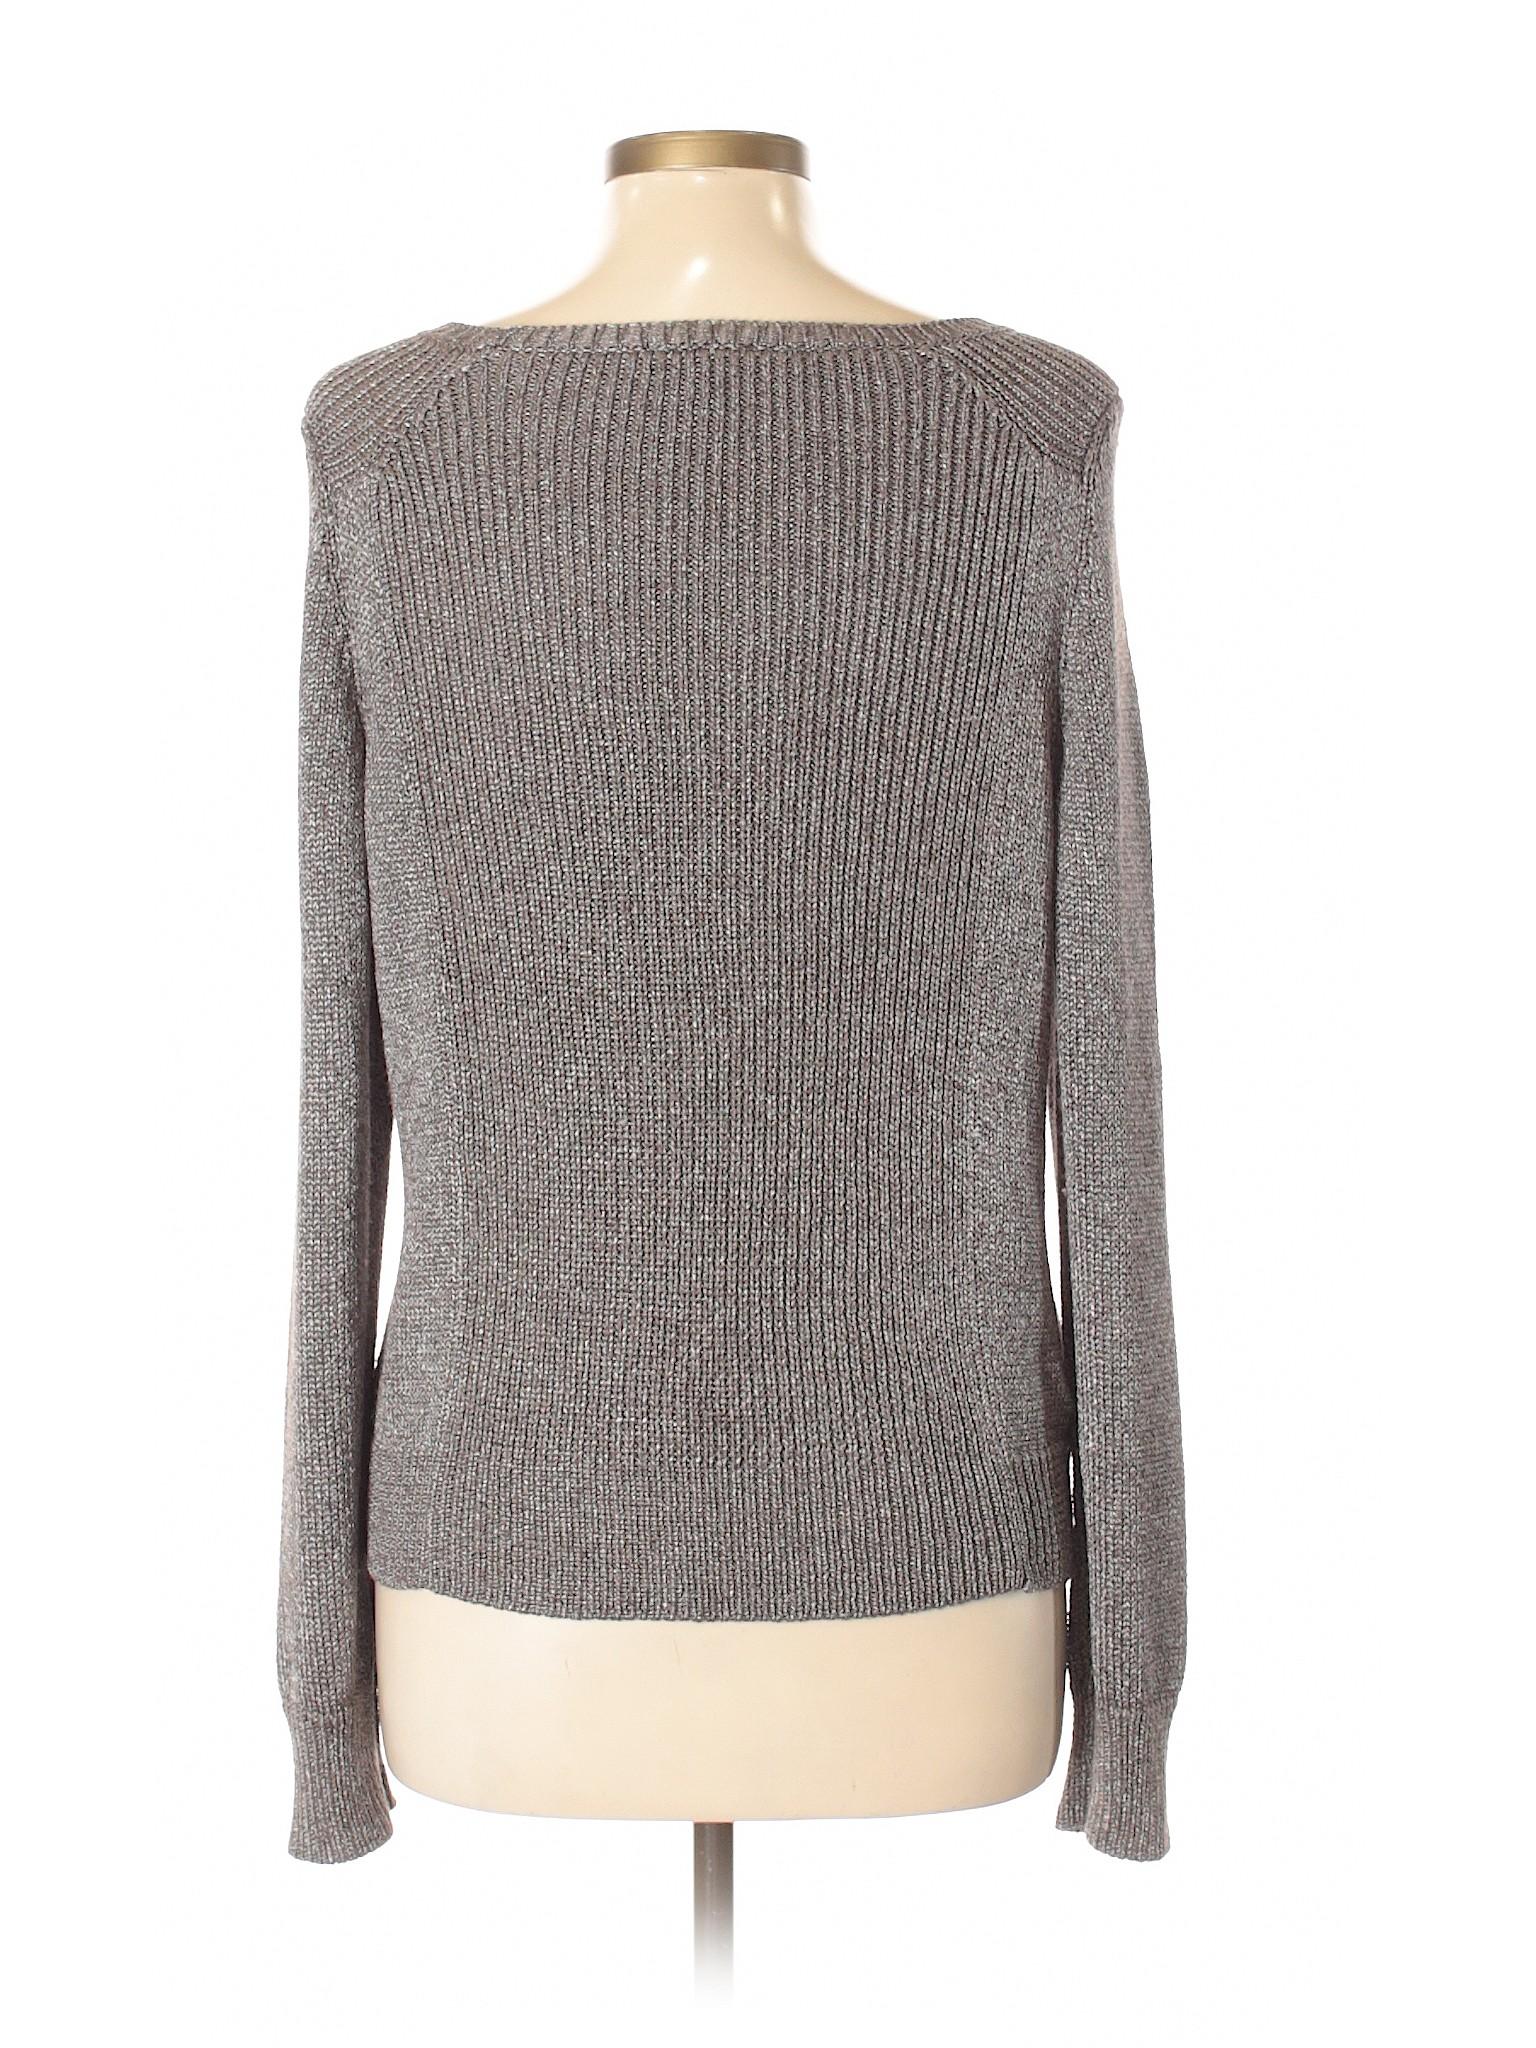 Boutique Fisher Eileen Sweater Pullover winter ffSrBwq4